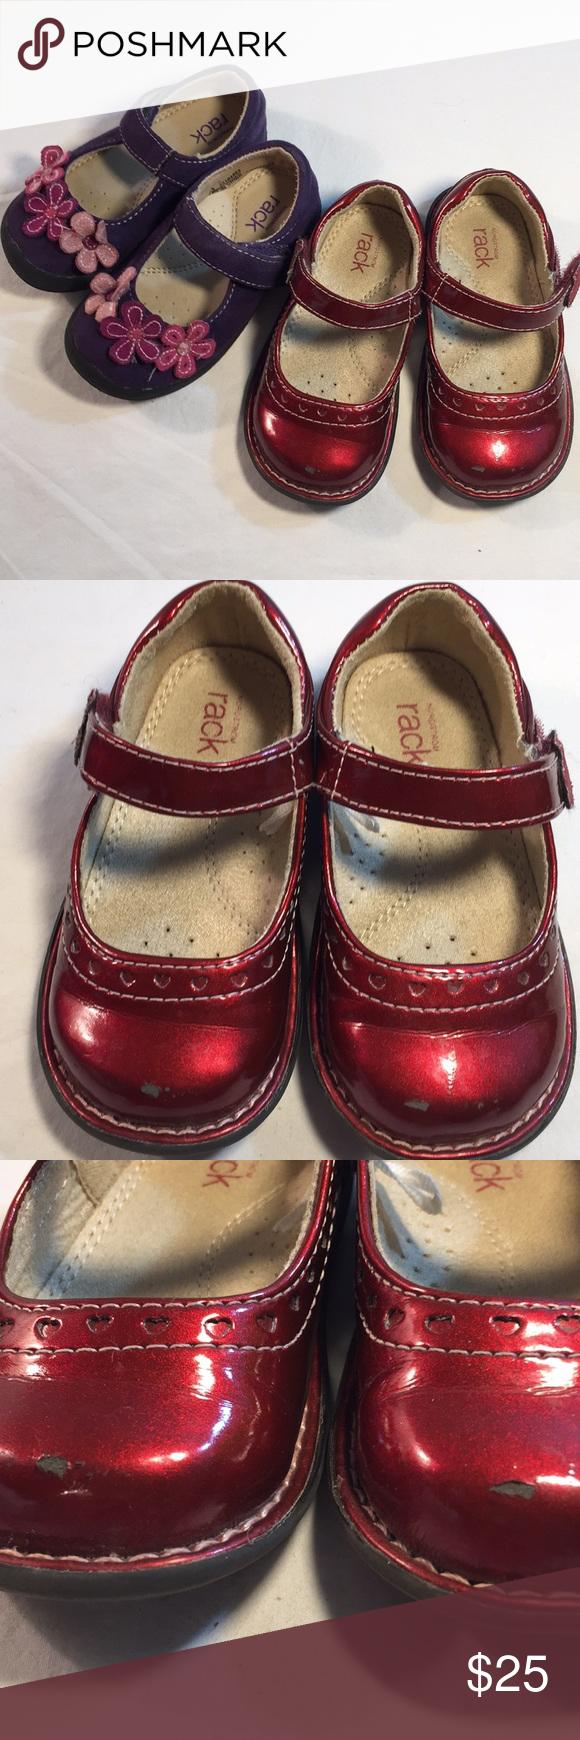 c7b77f43bc3 2 Nordstrom rack toddler girls shoes